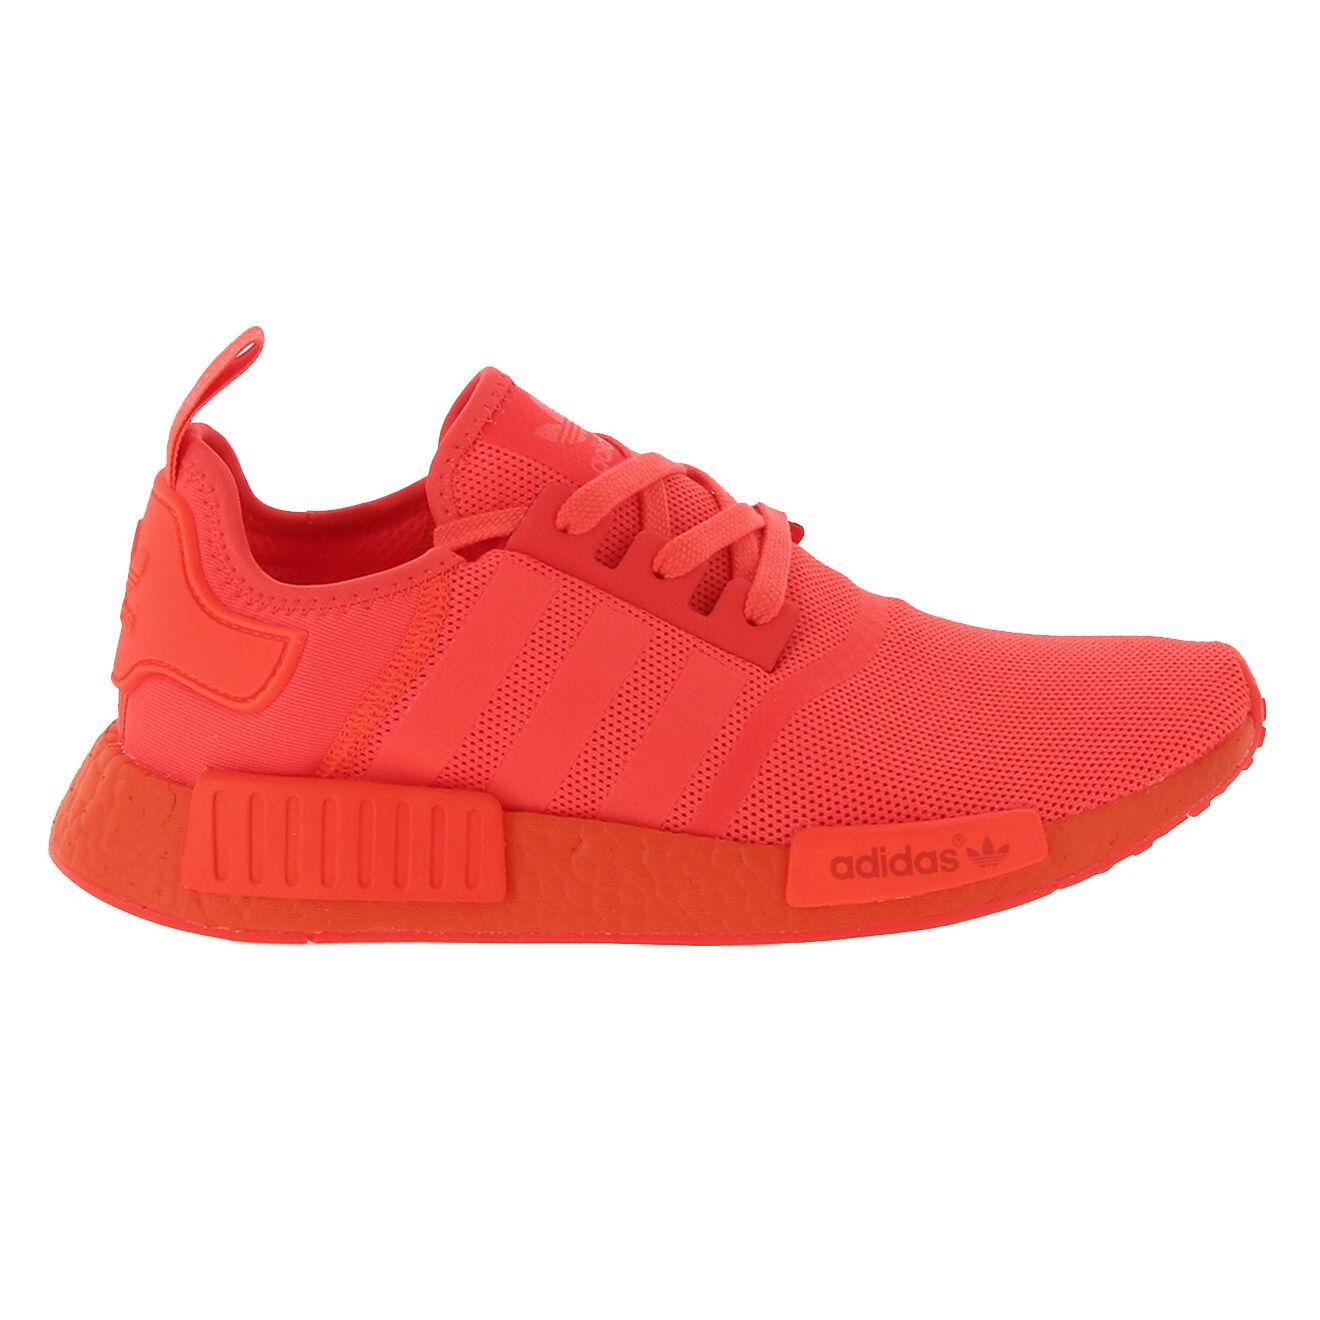 Baskets Nmd_R1 rouges - Adidas - Modalova